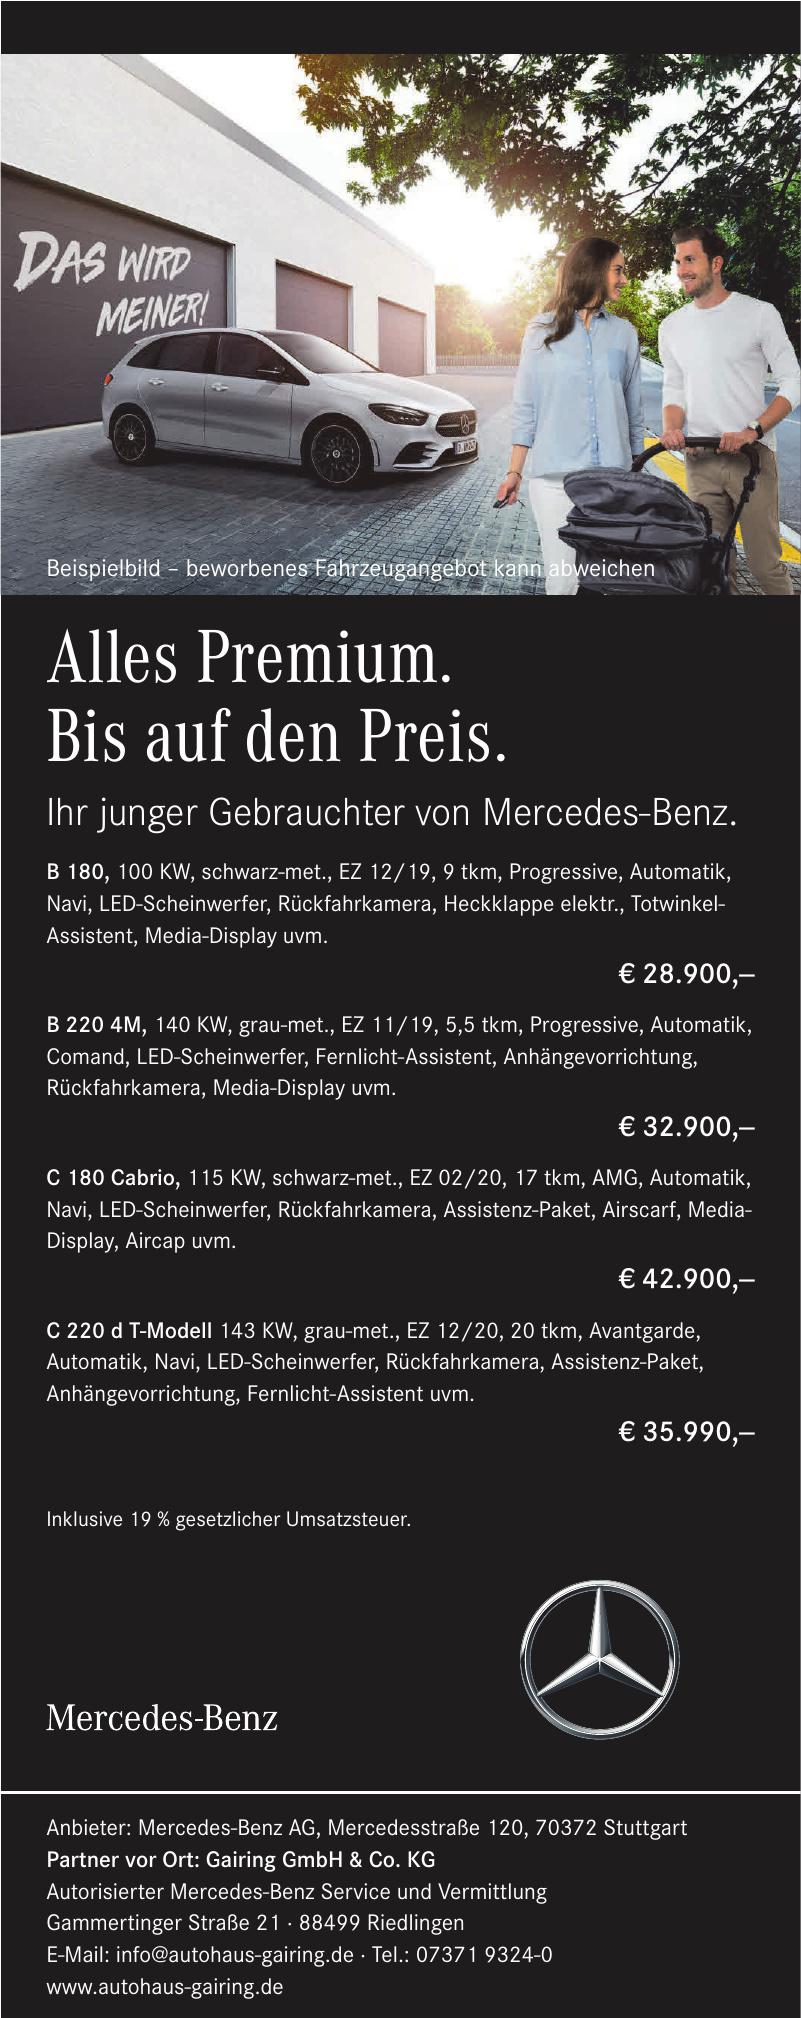 Gairing GmbH & Co KG